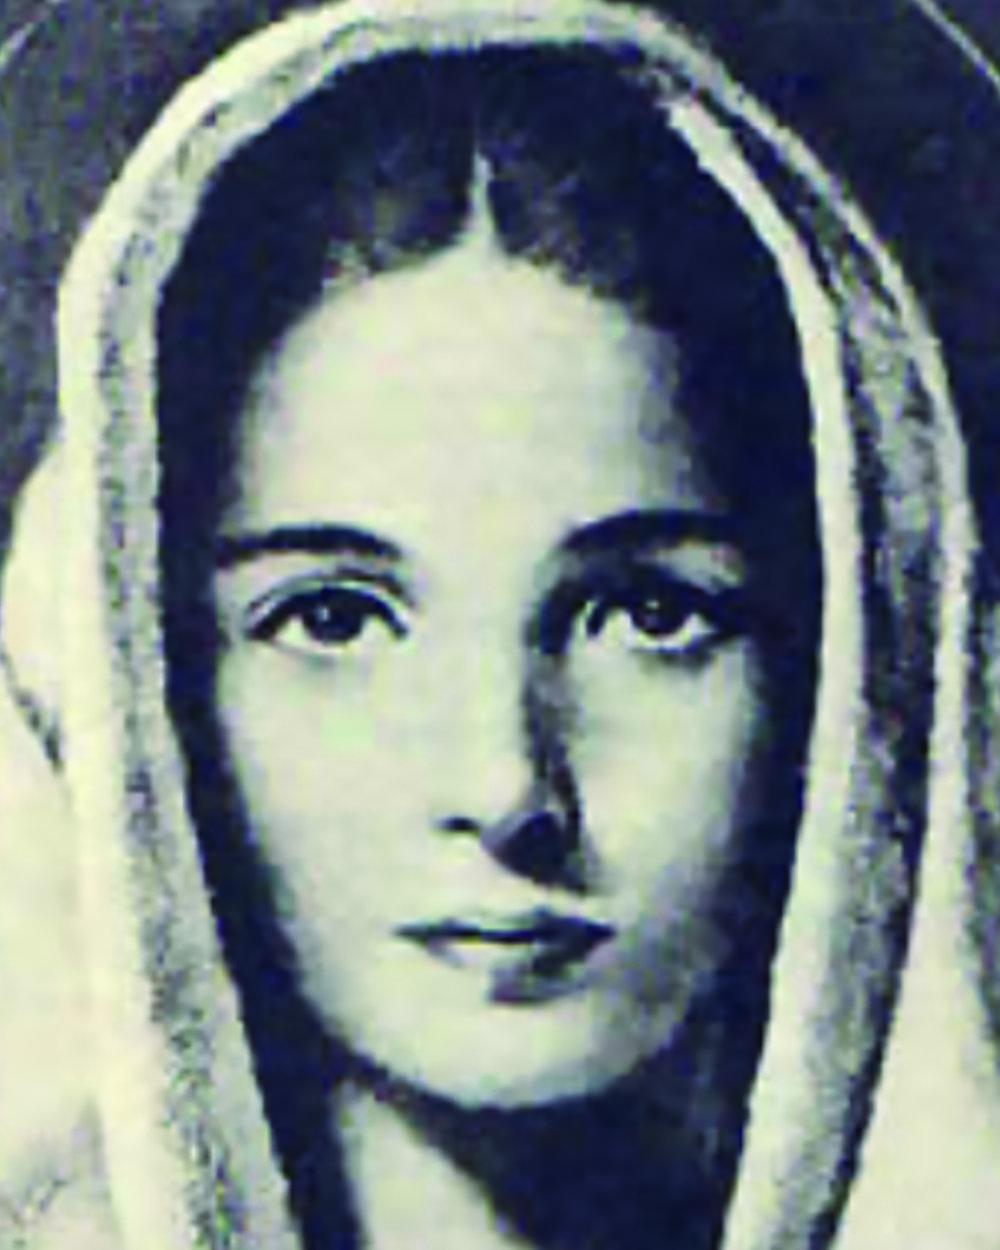 tTAz2O3CShGsXqBvESJn_Mother Mary 8x10.jpg